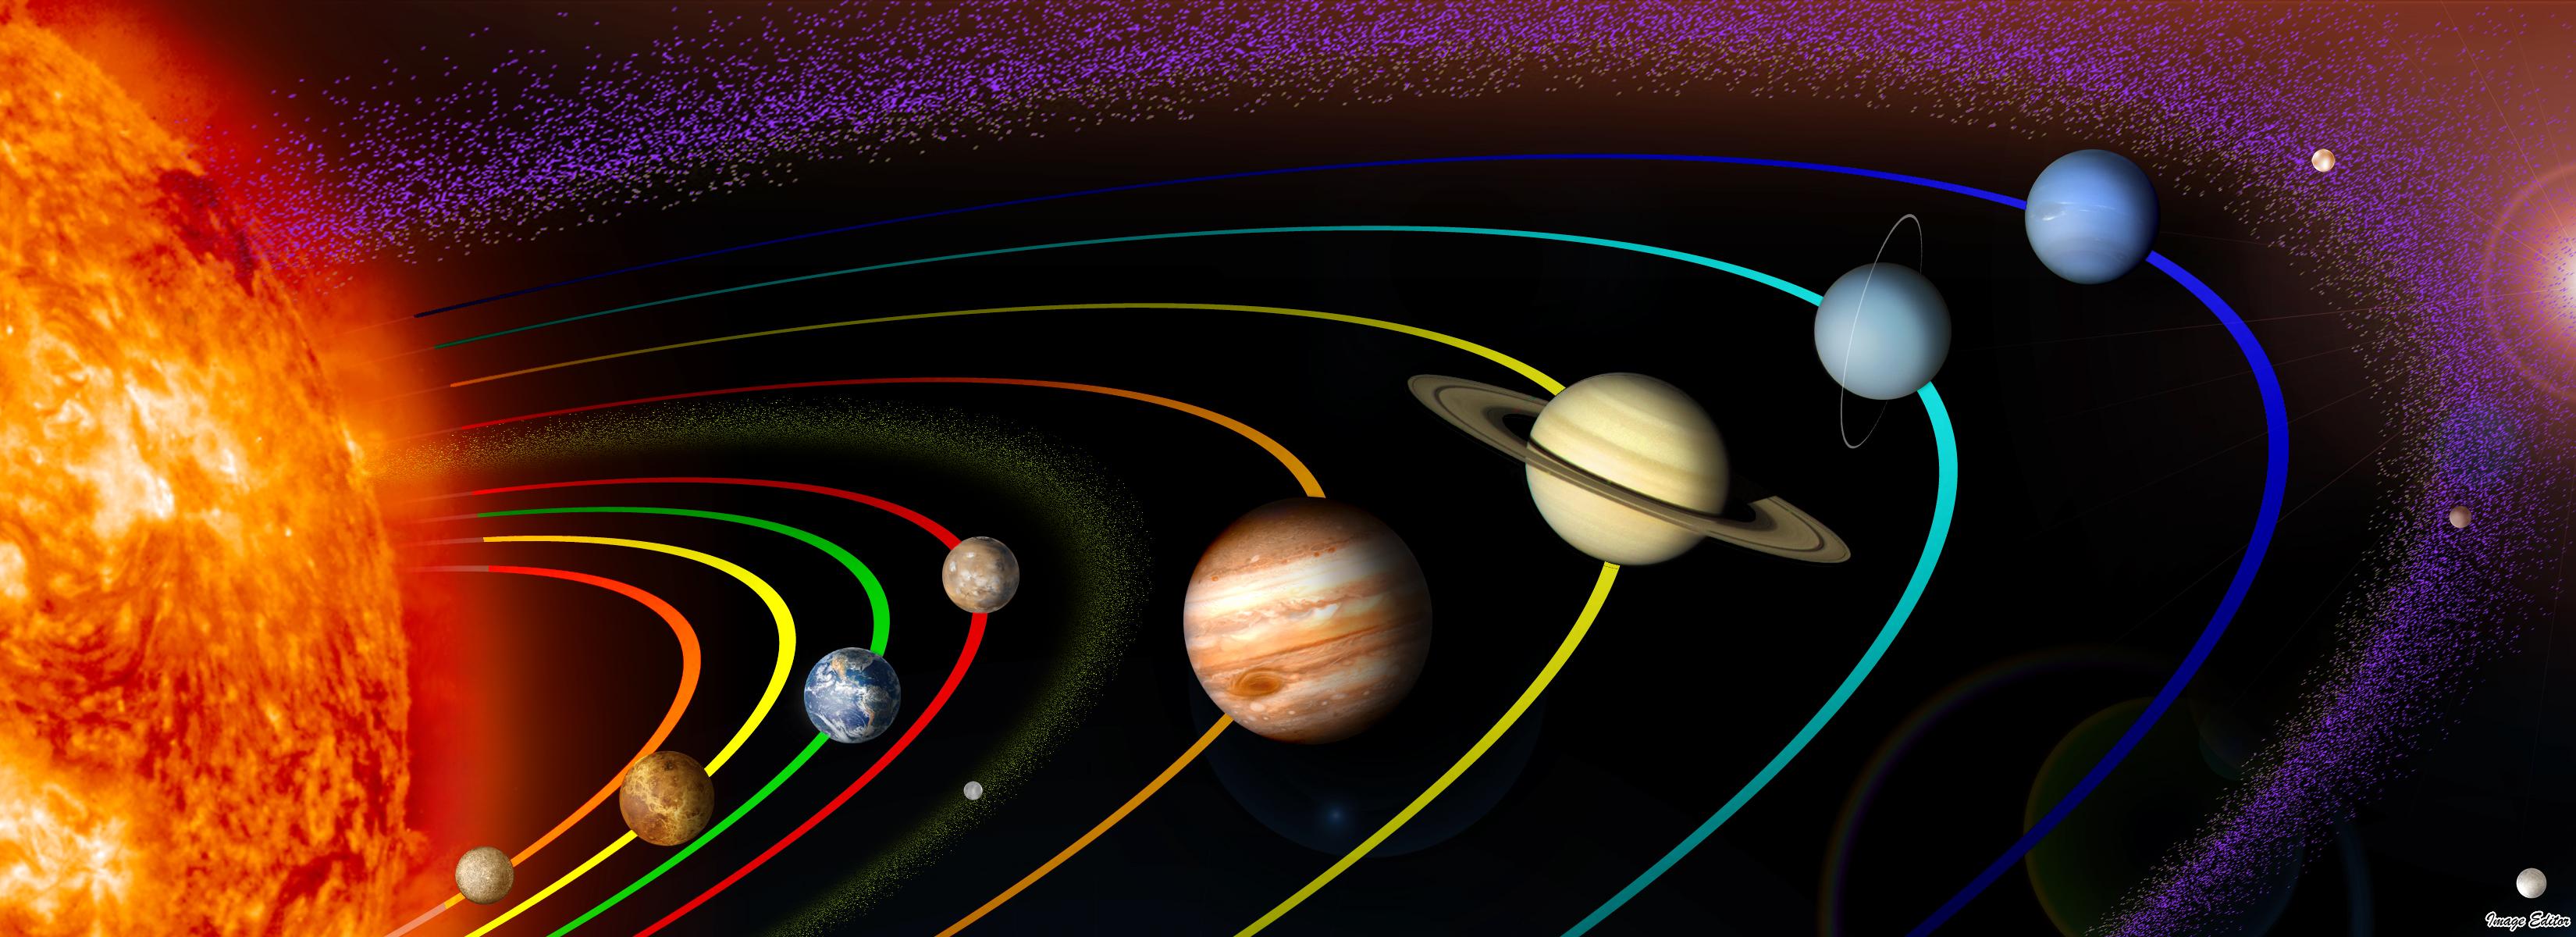 Wallpaper Planet NASA Sky Earth Sun Circle Atmosphere Mars Jupiter Universe Saturn Mercury Venus Uranus Neptune Pluto Ceres Planets